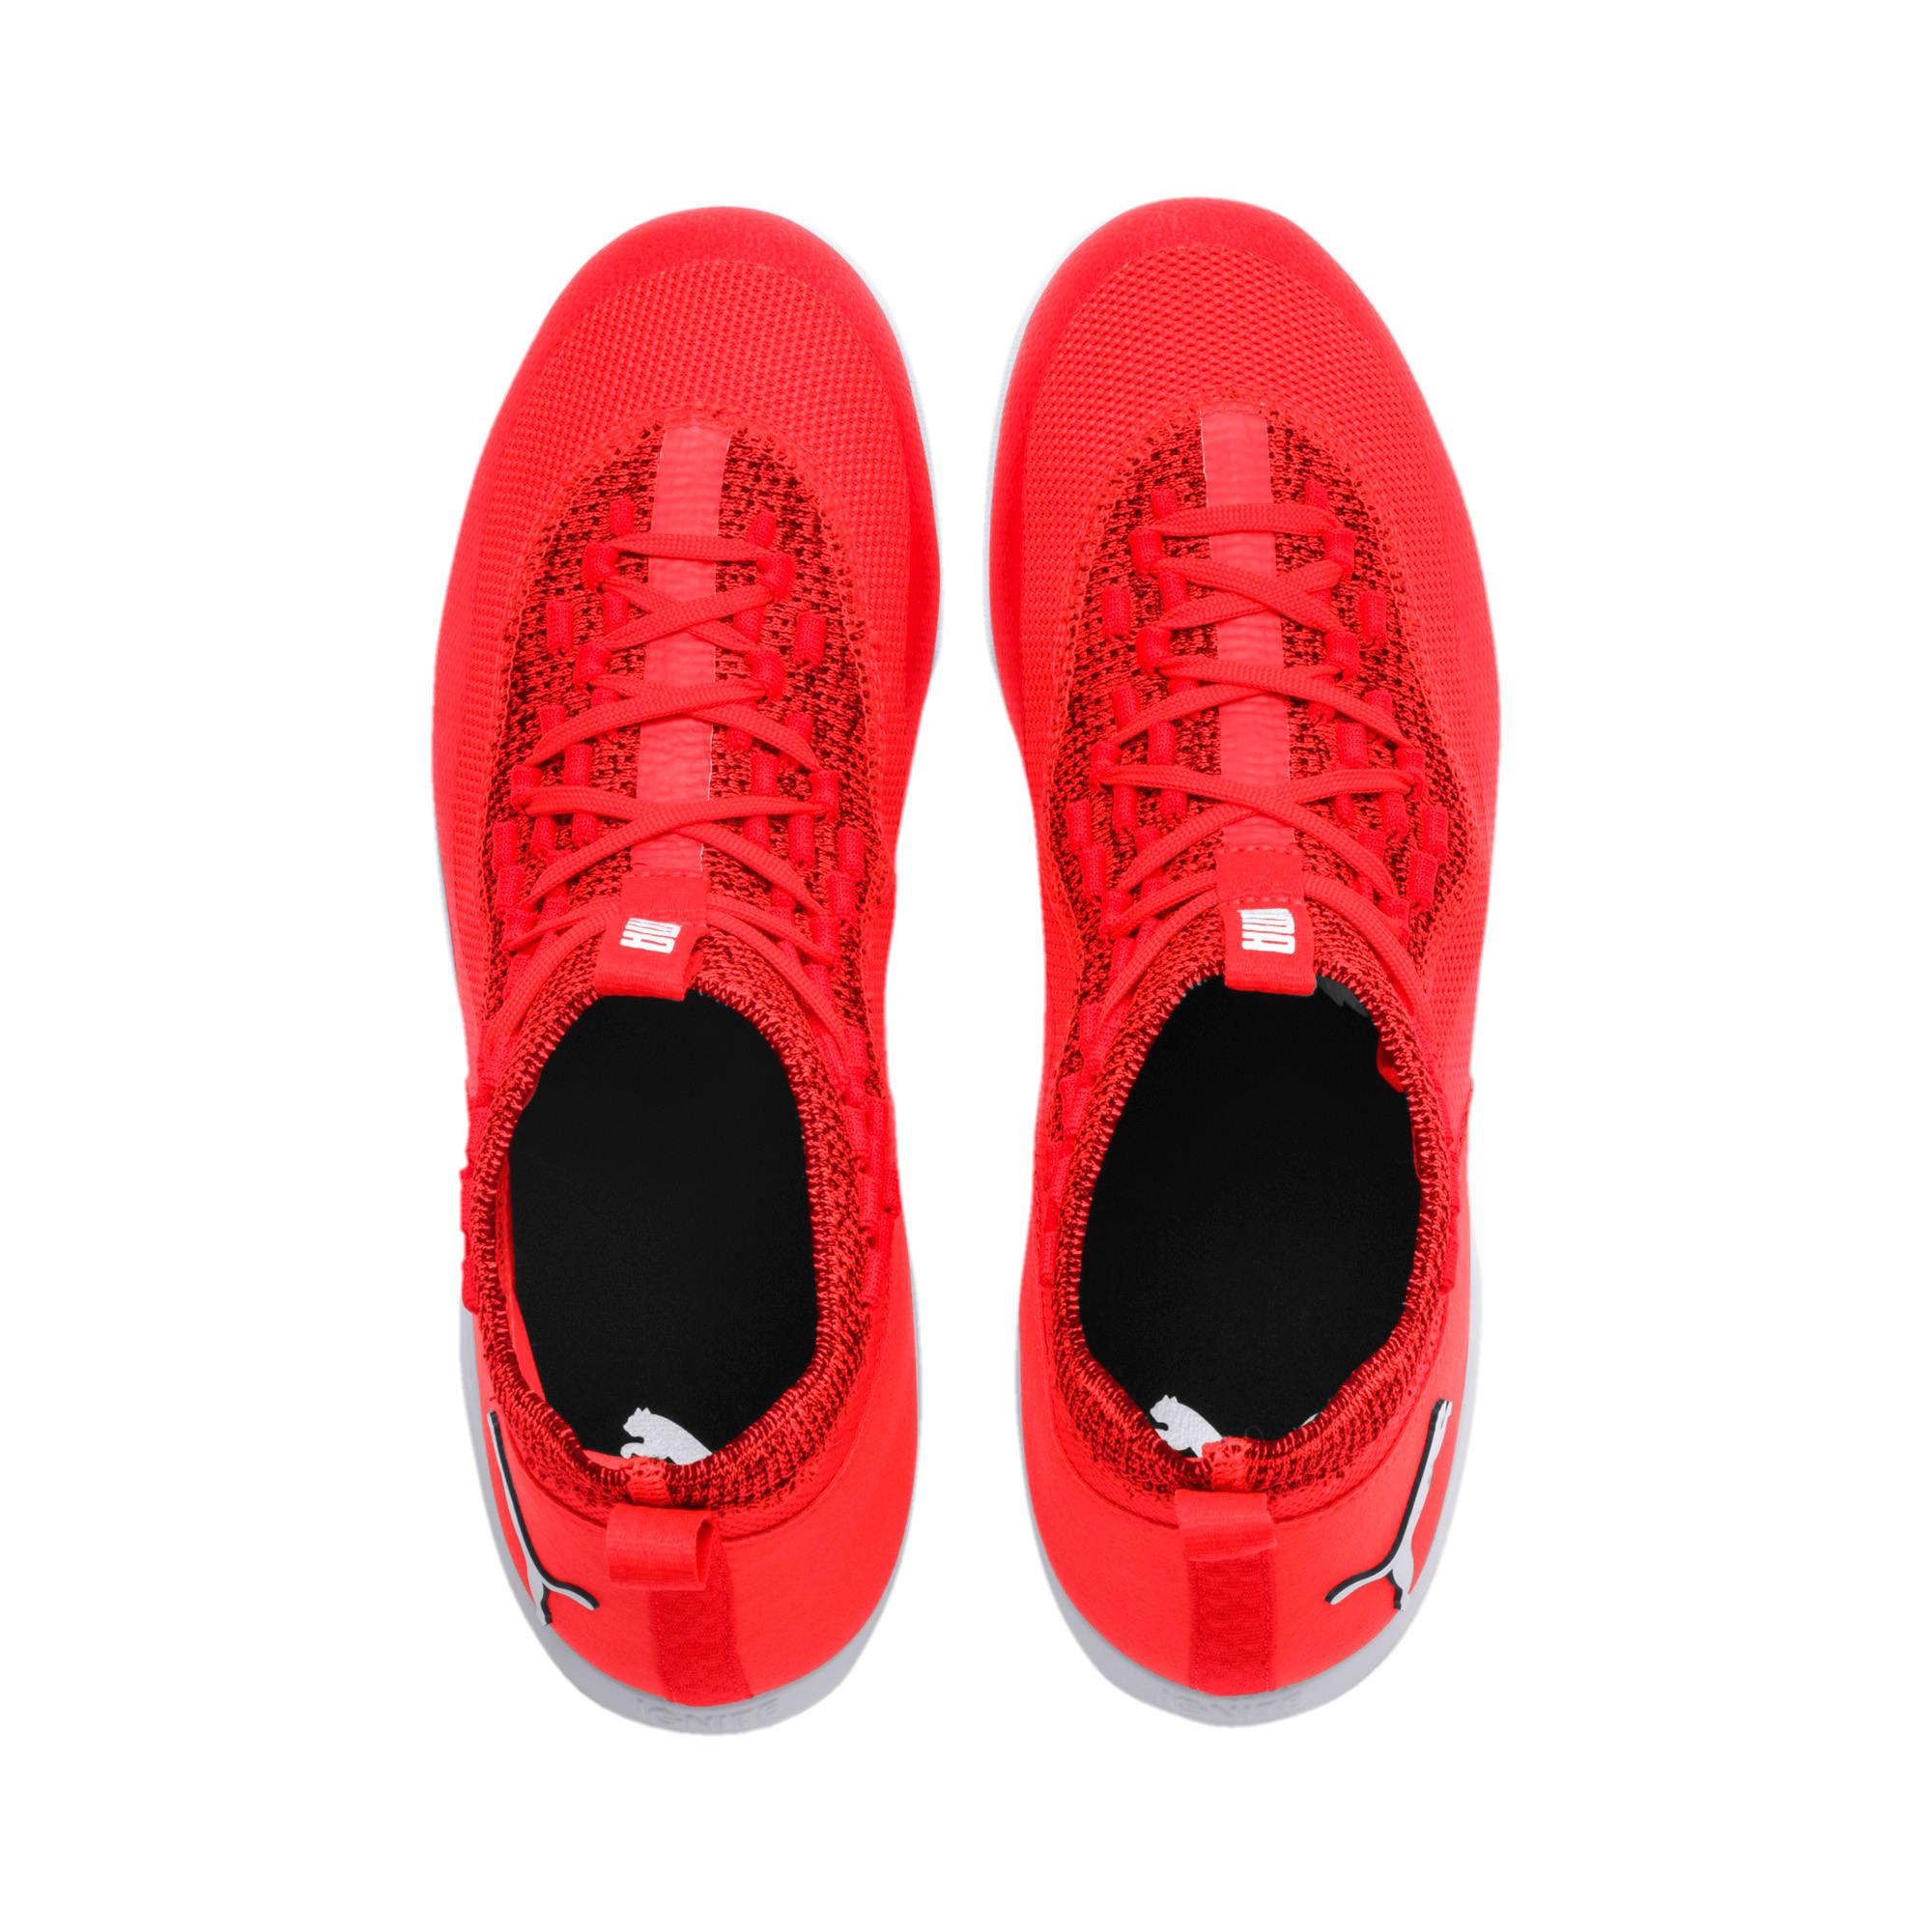 Thumbnail 6 of 365 IGNITE Fuse P 1 Men's Soccer Shoes, Red Blast-White-Puma Black, medium